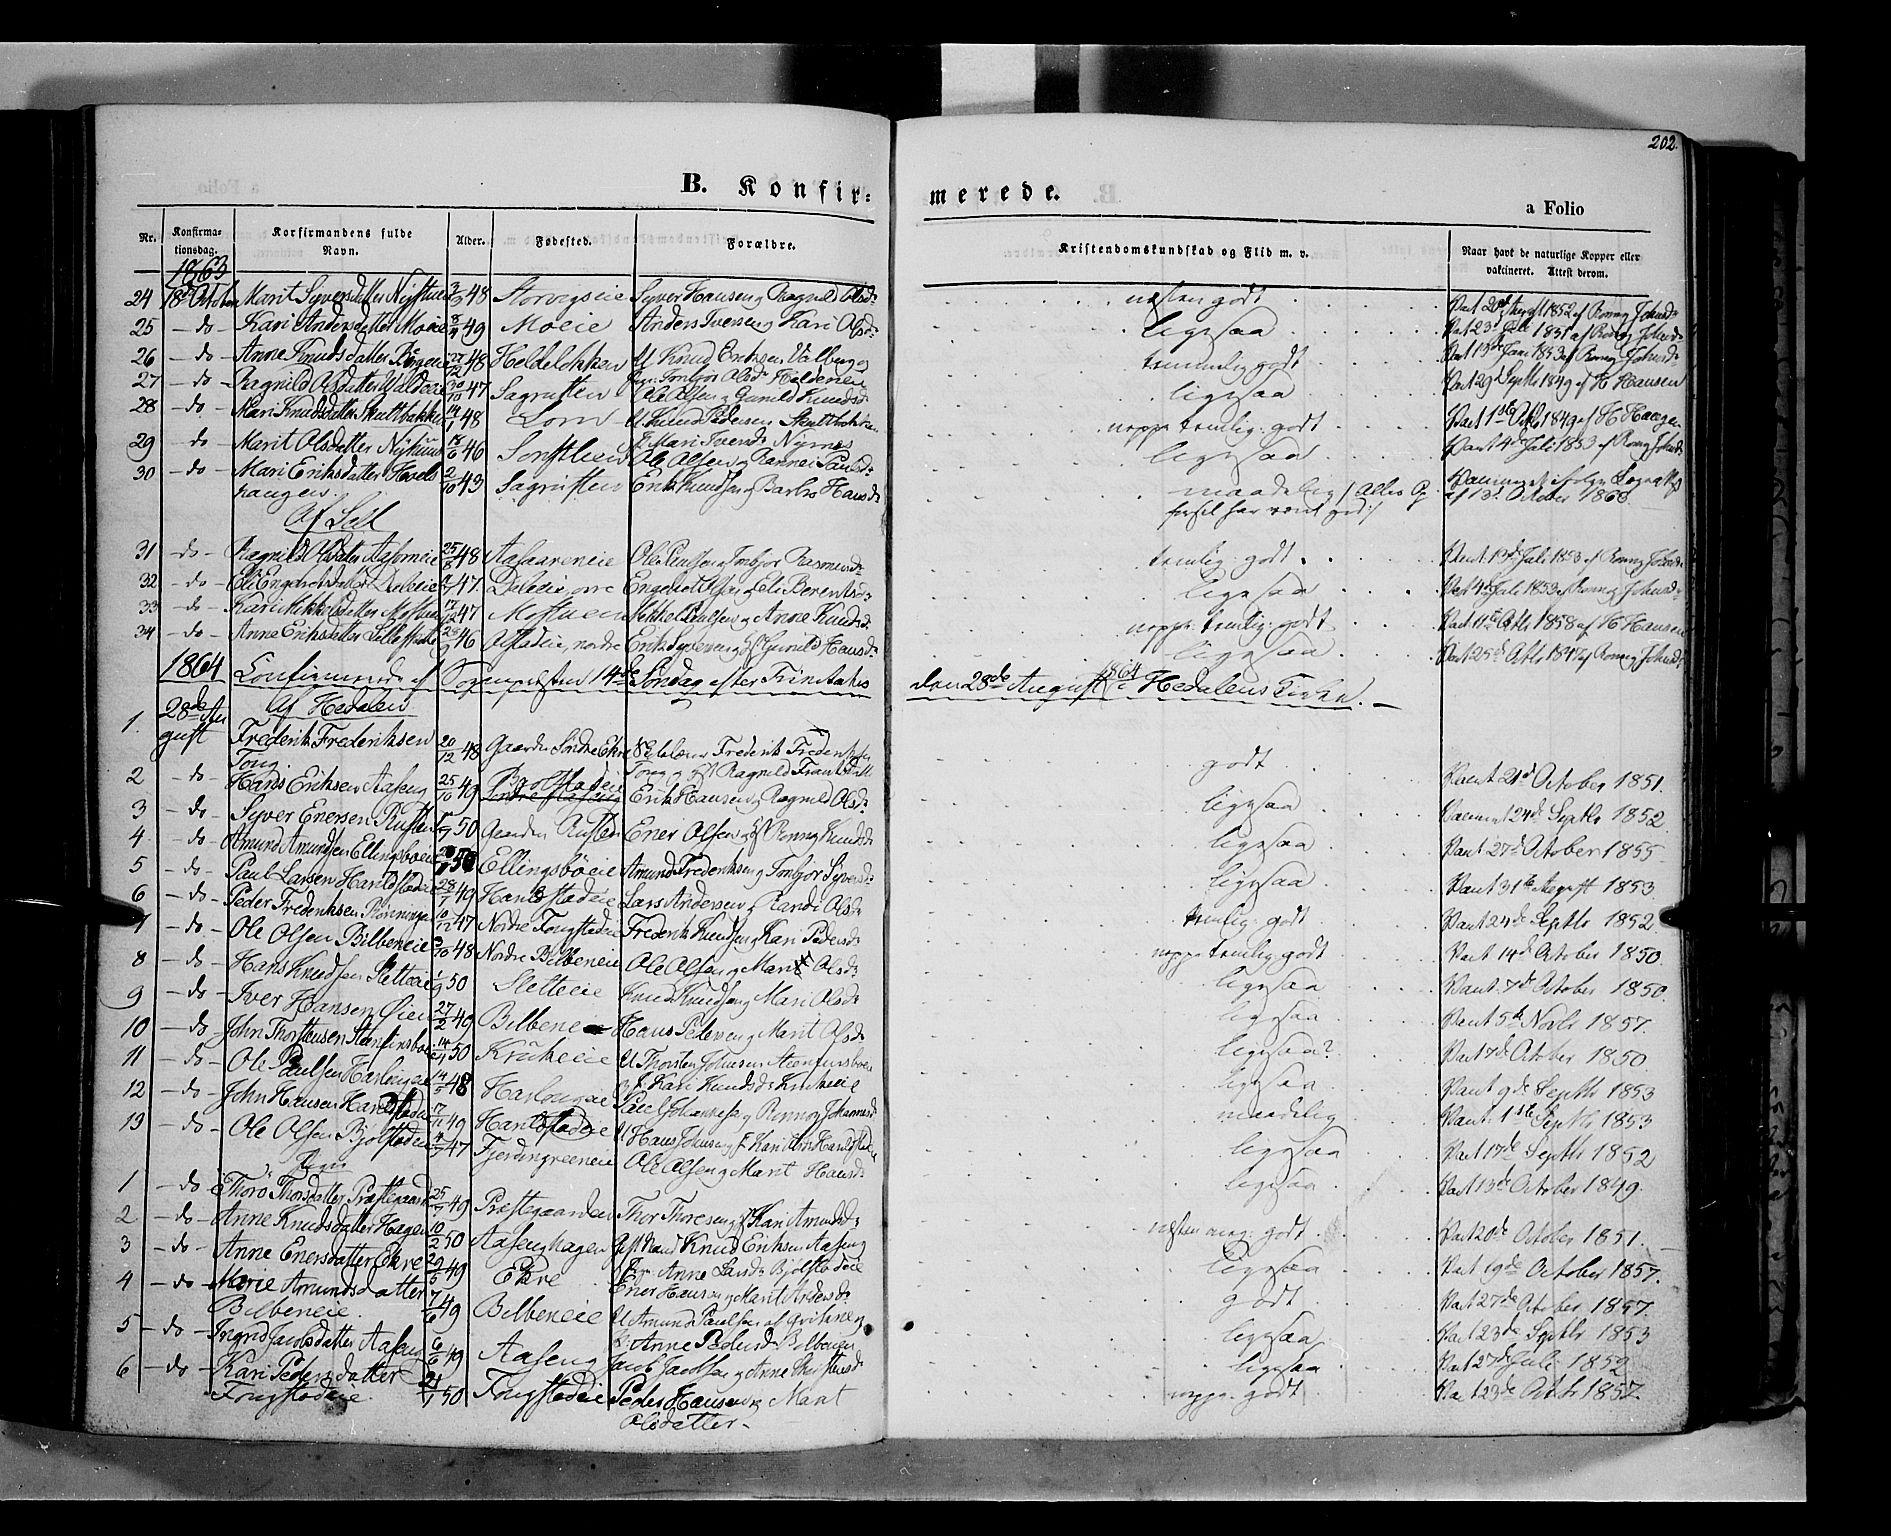 SAH, Vågå prestekontor, Ministerialbok nr. 6 /1, 1856-1872, s. 202